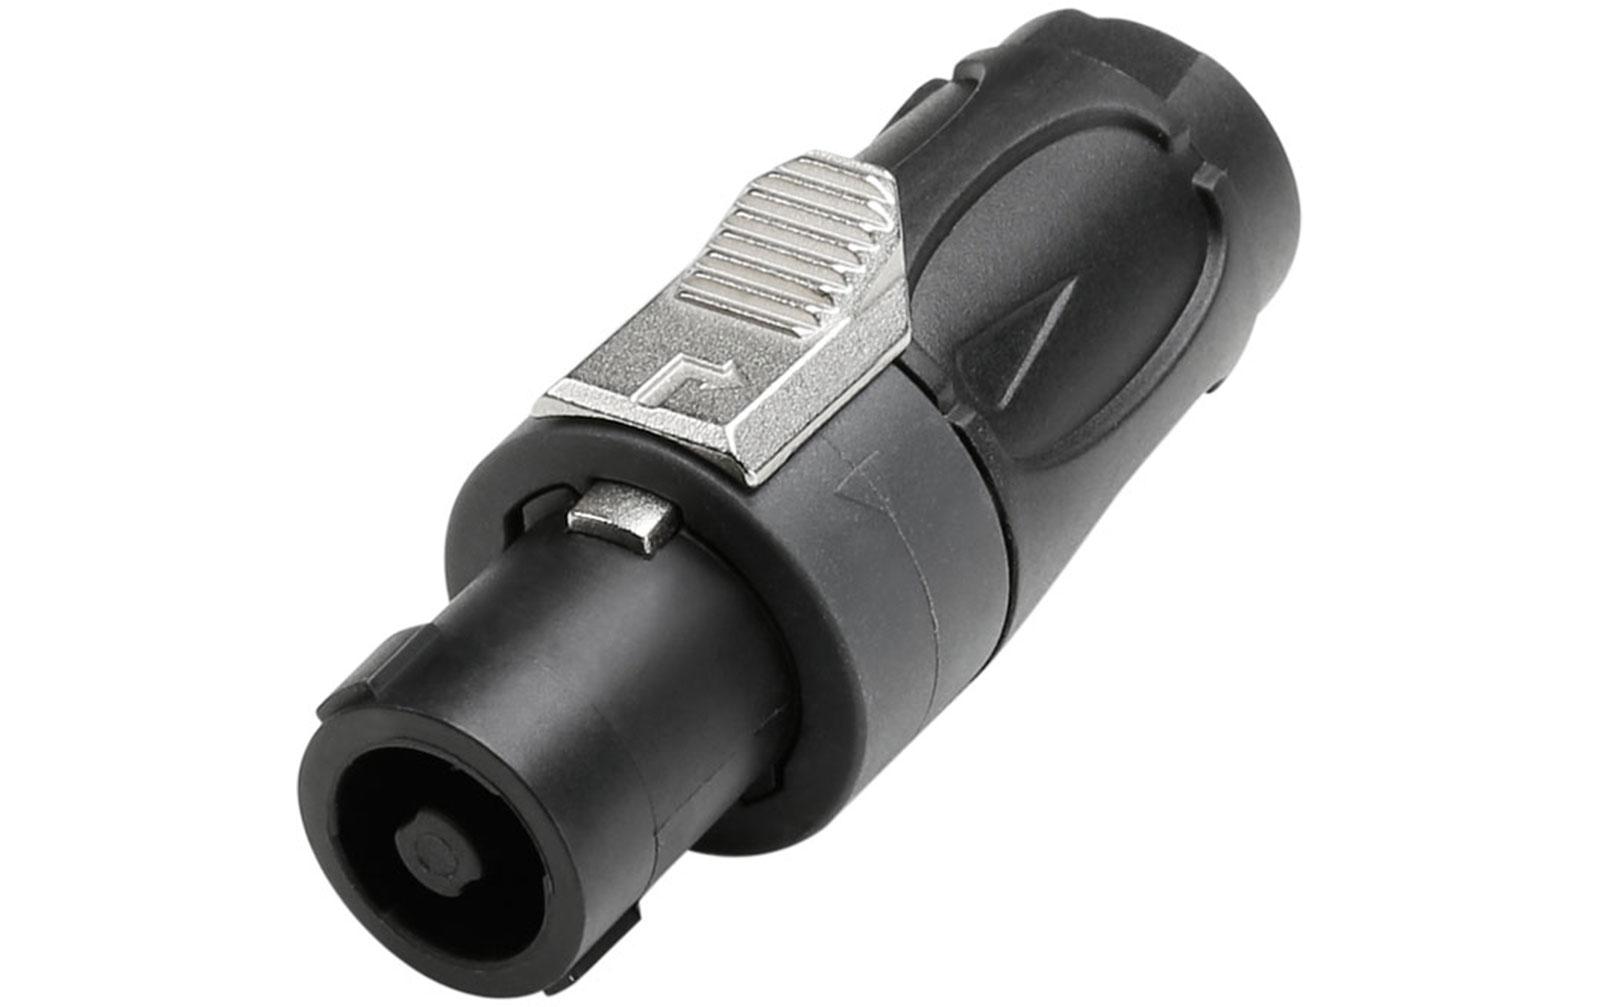 adam-hall-7902-standard-lautsprecherverbinder-4-pol-schwarz-dunkelgrau